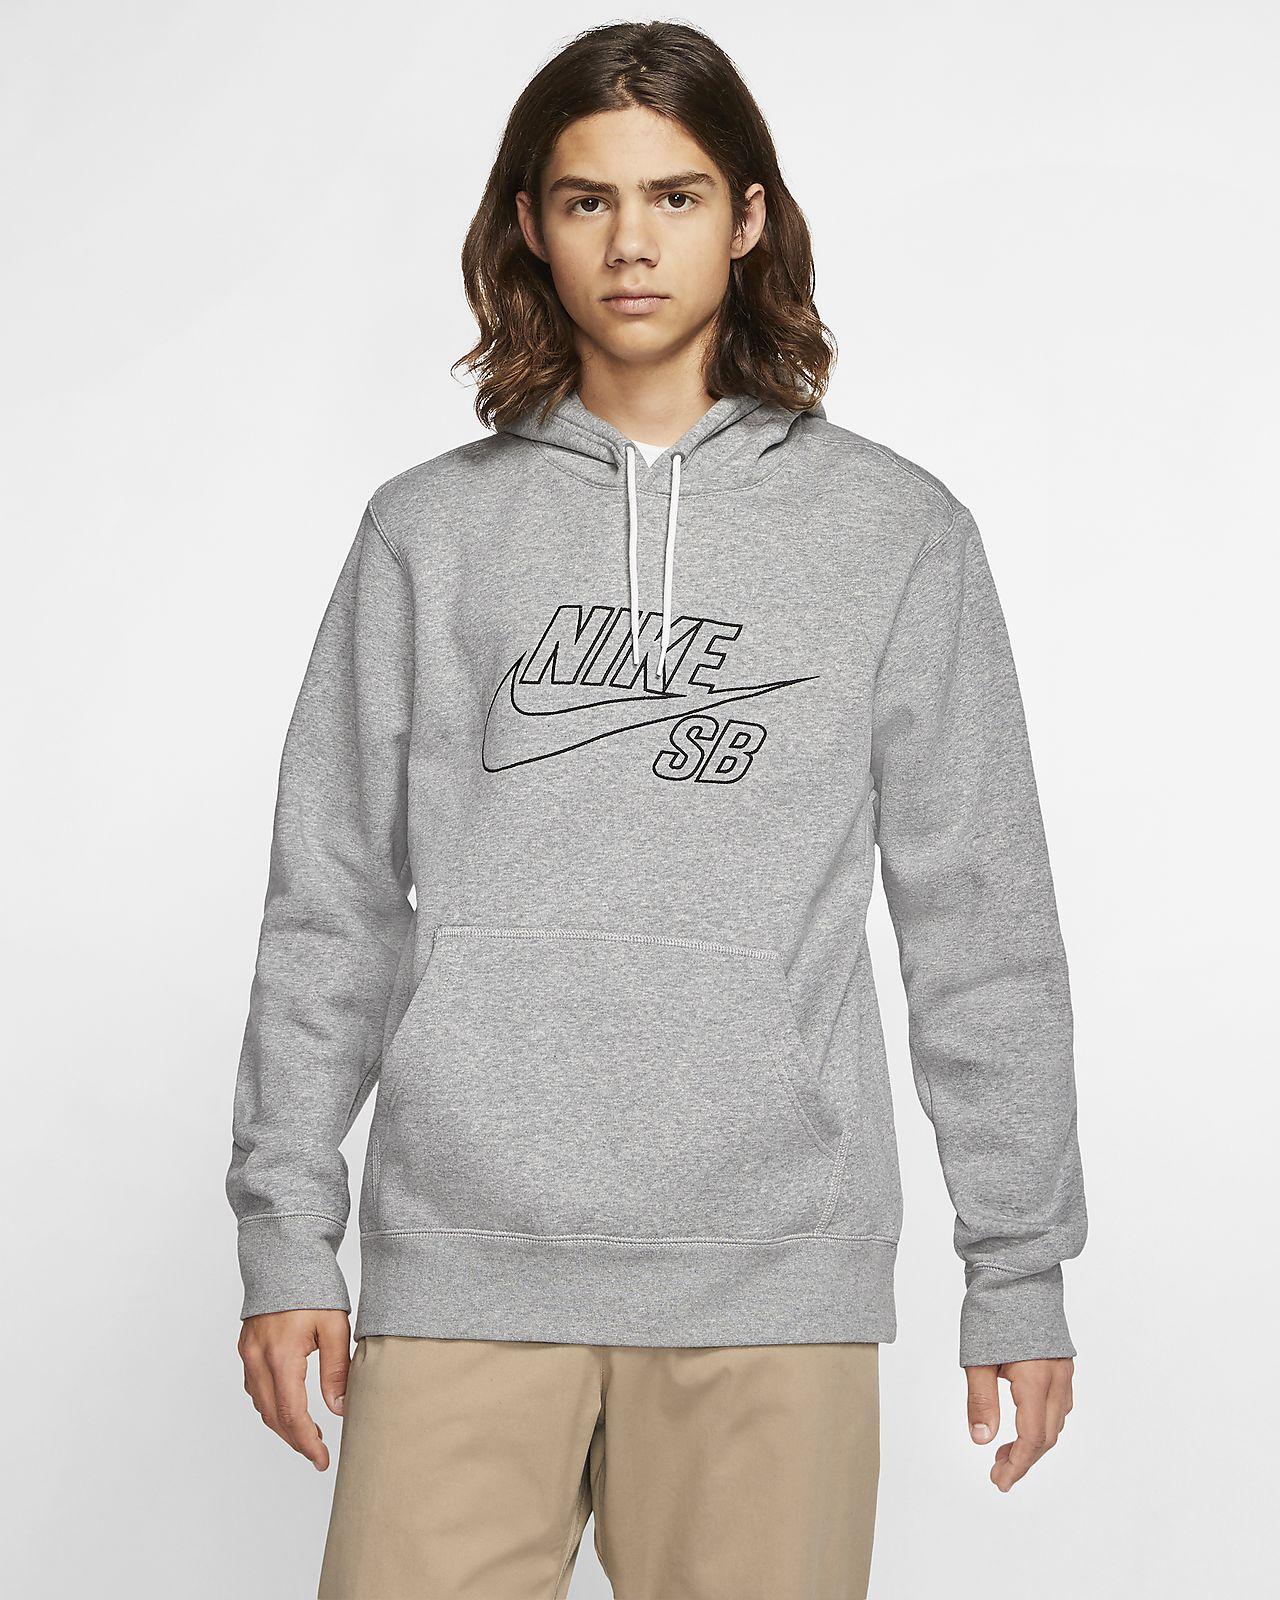 Męska bluza z kapturem do skateboardingu Nike SB